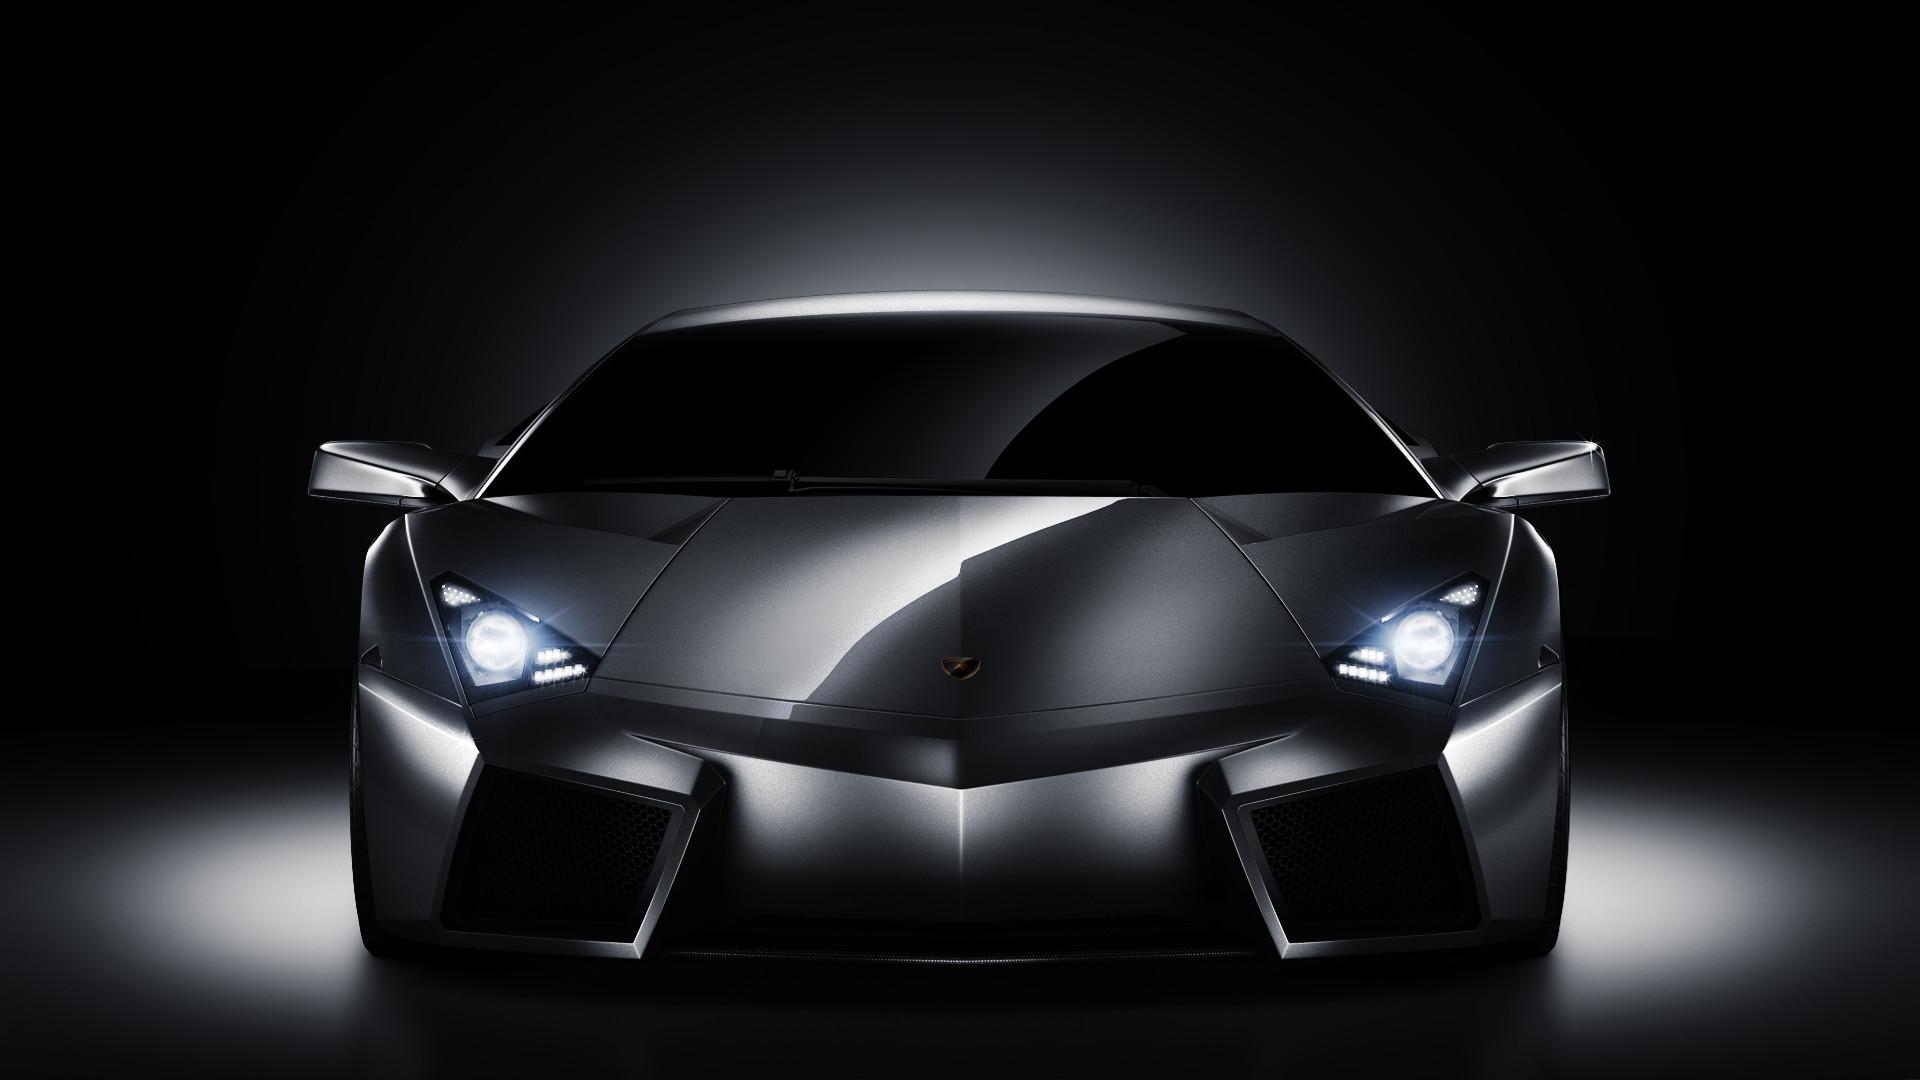 Res: 1920x1080, Fahrzeuge - Lamborghini Wallpaper